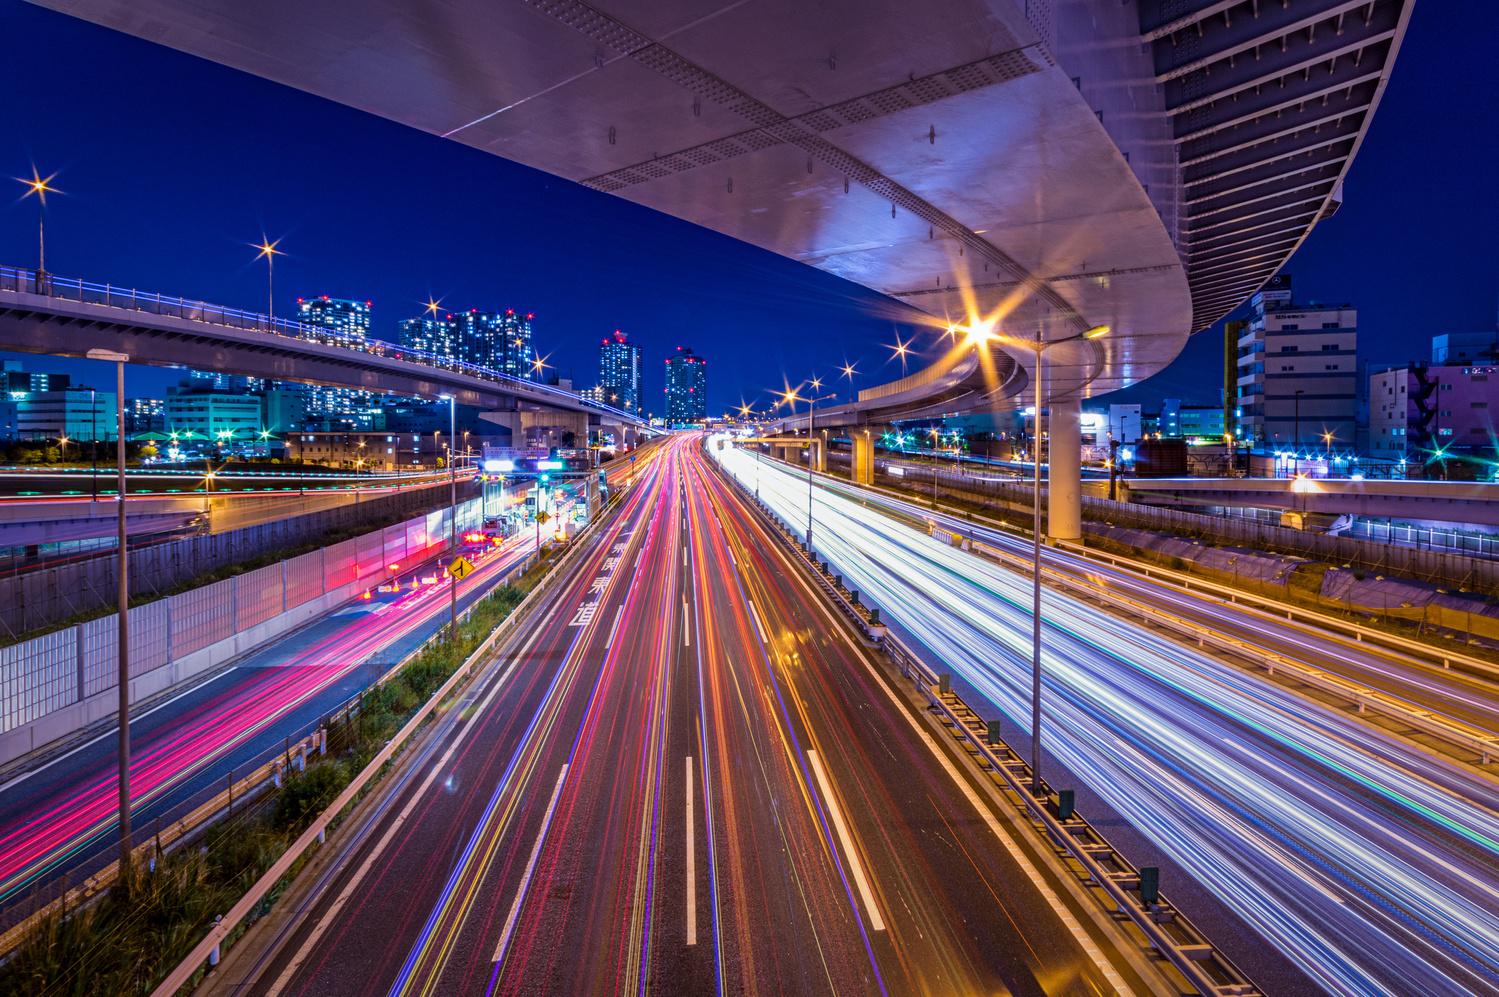 Stream of Tokyo Wangan Expressway by 45 tmr